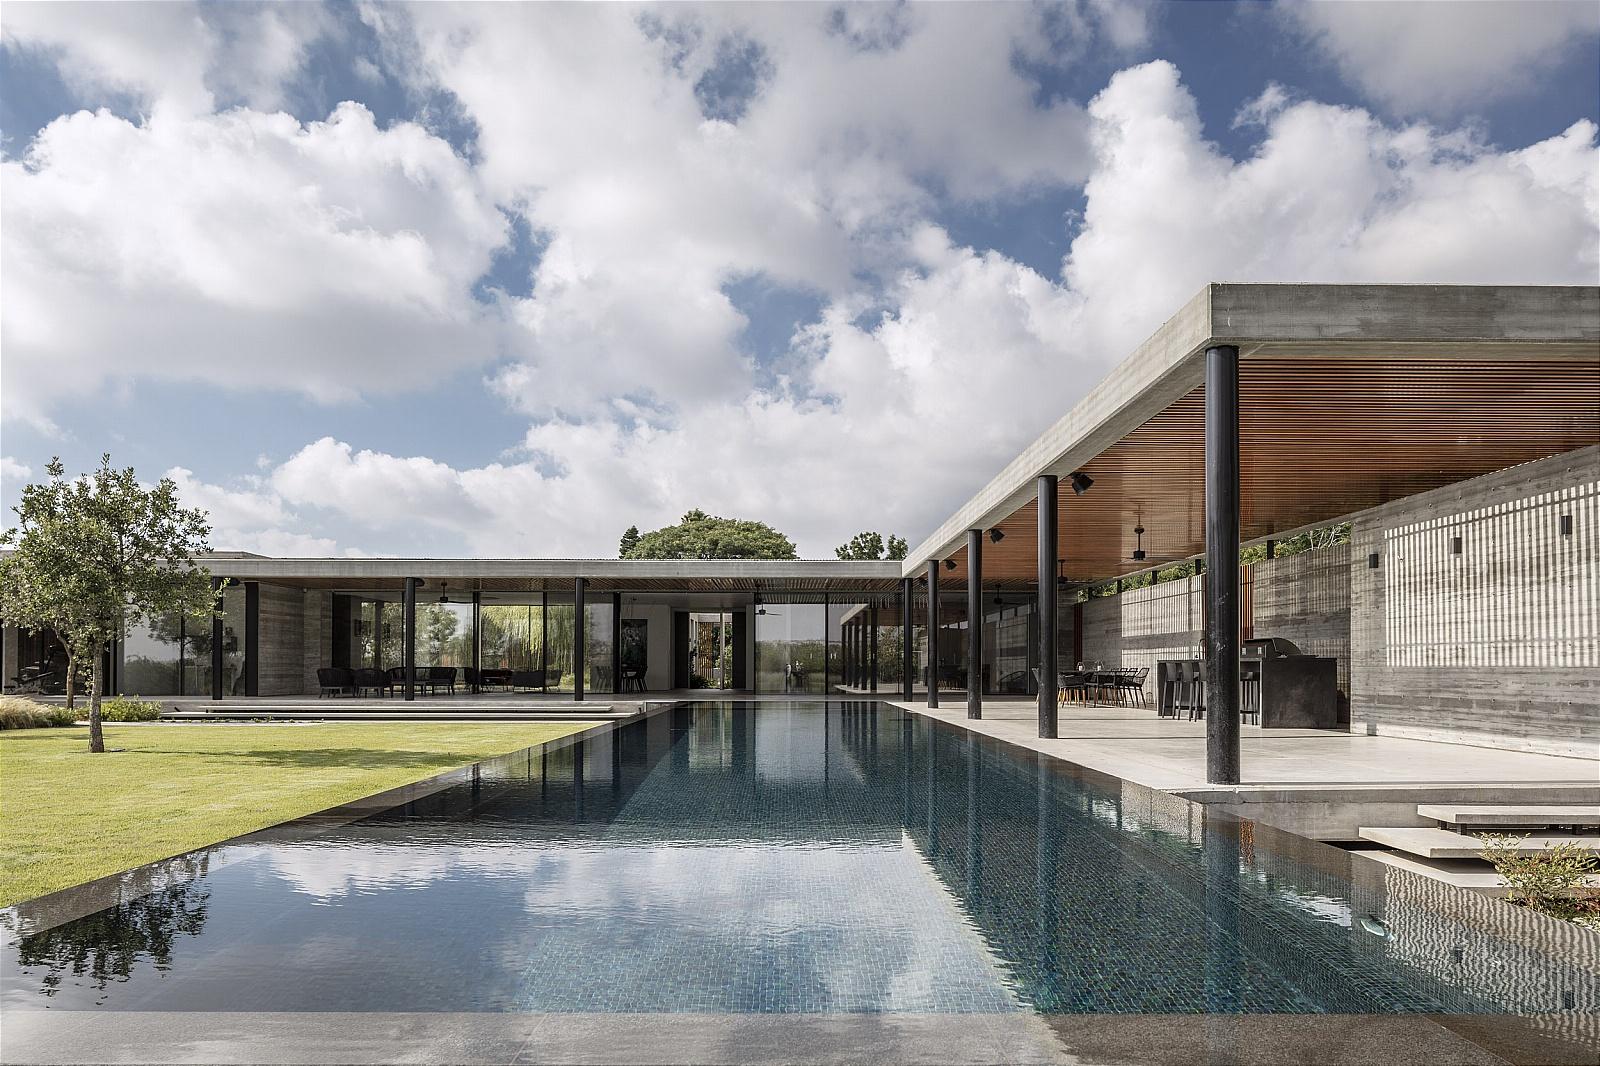 עיצוב אדריכלי בבטון